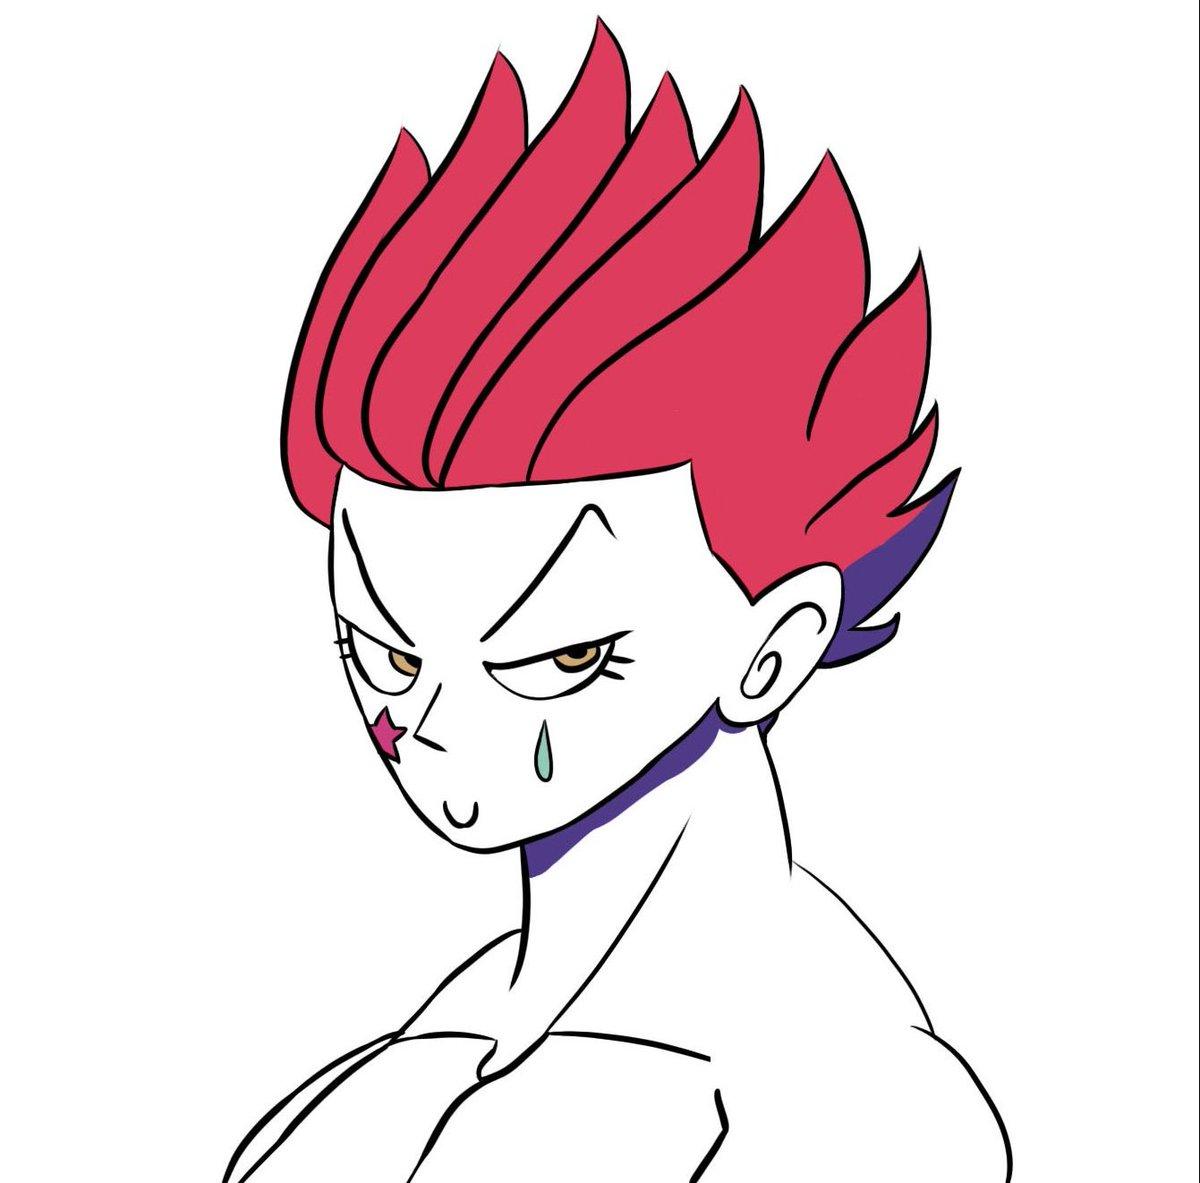 Zain On Twitter It S Back Again Art Fanart Hunterxhunter Hxh Hisoka Anime Manga Drawing Digitalart Illustration